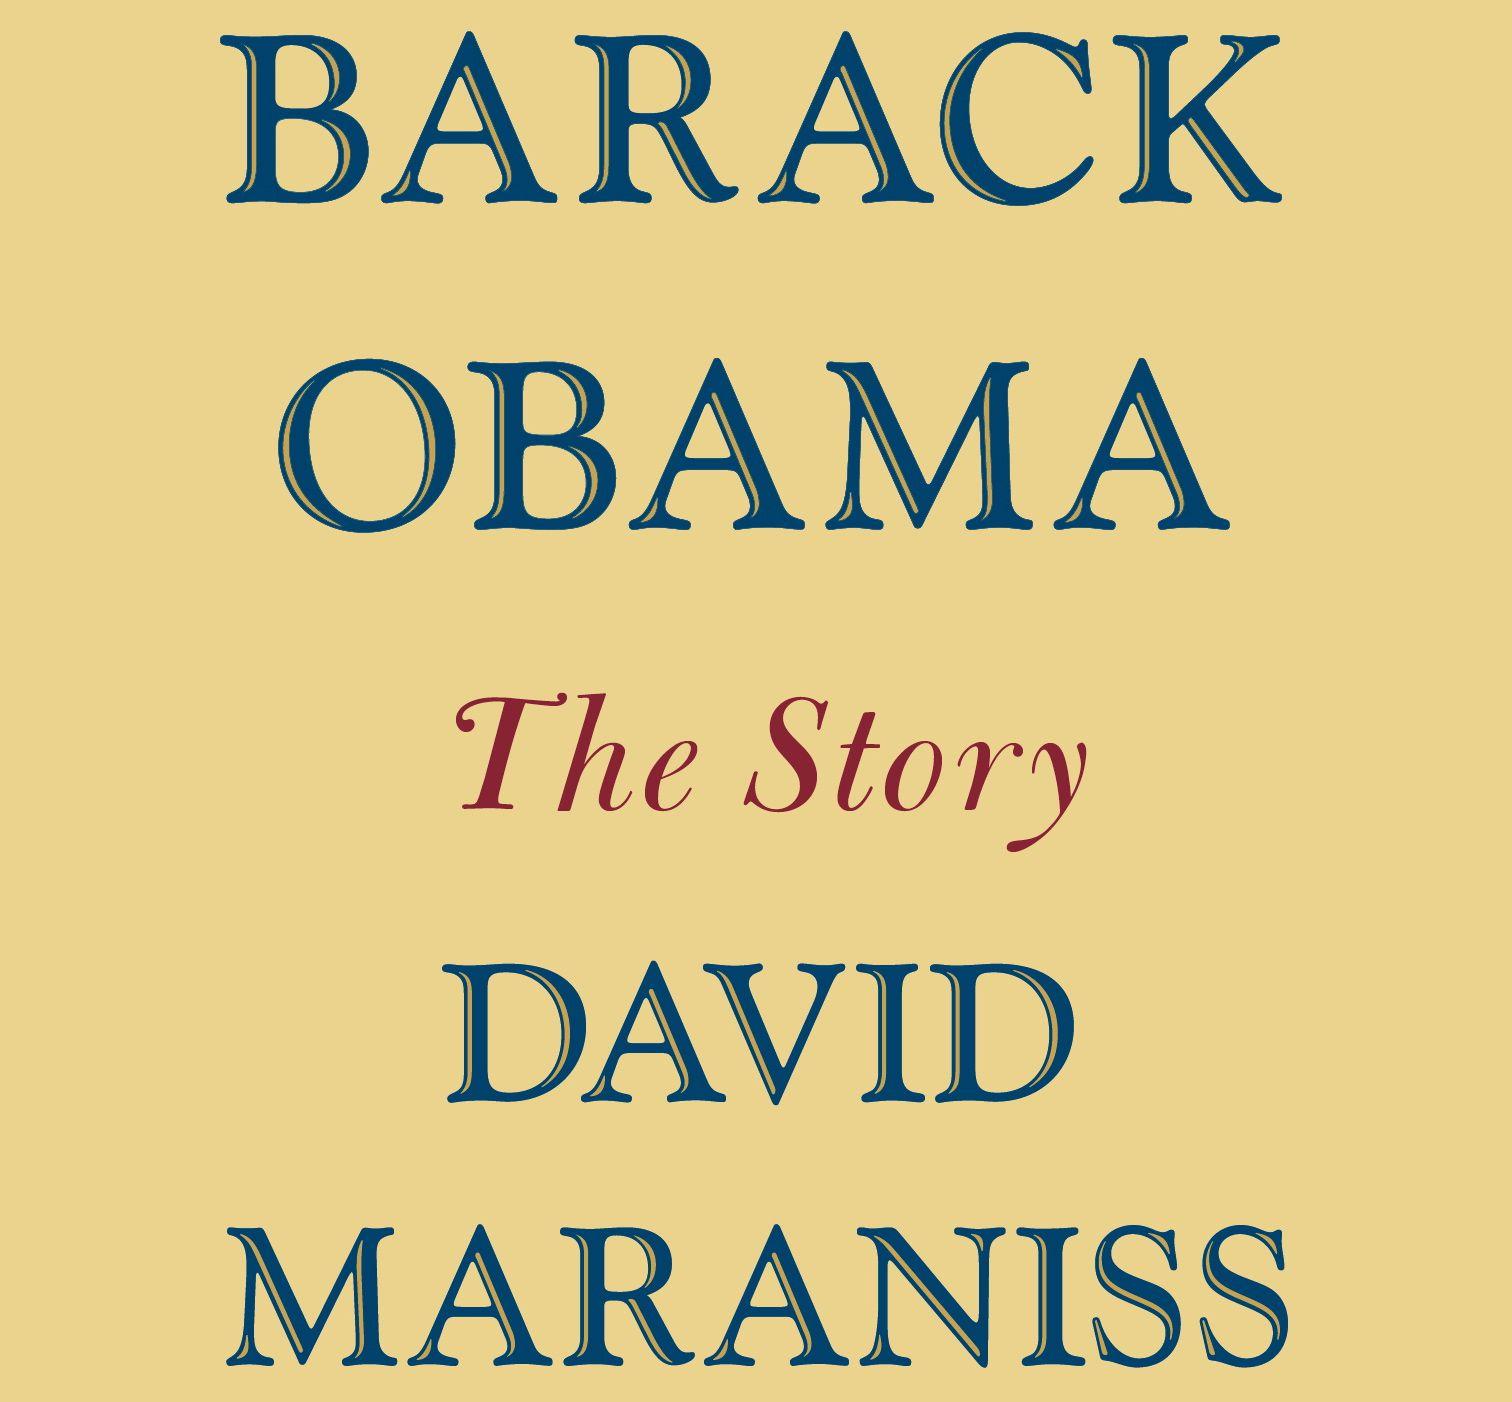 Barak Obama de David Mereniss